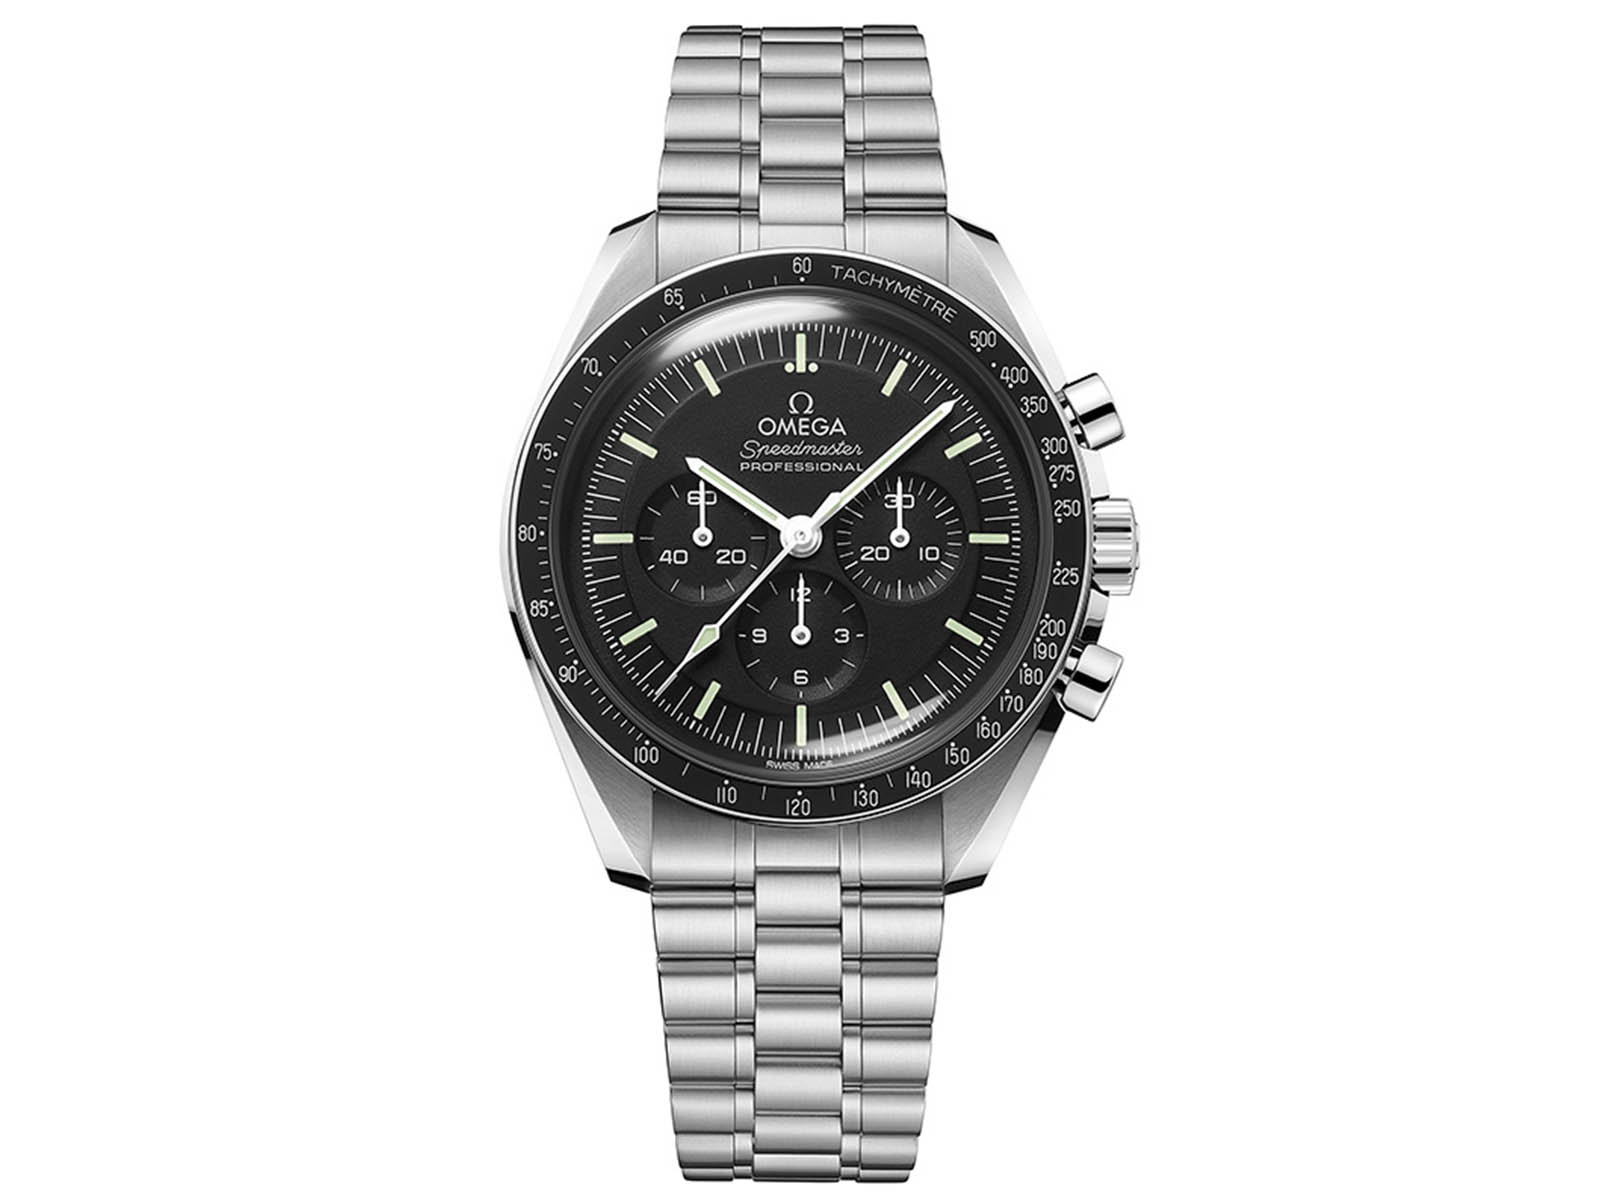 310-30-42-50-01-001-omega-speedmaster-moonwatch-professional-master-chronometer-1.jpg